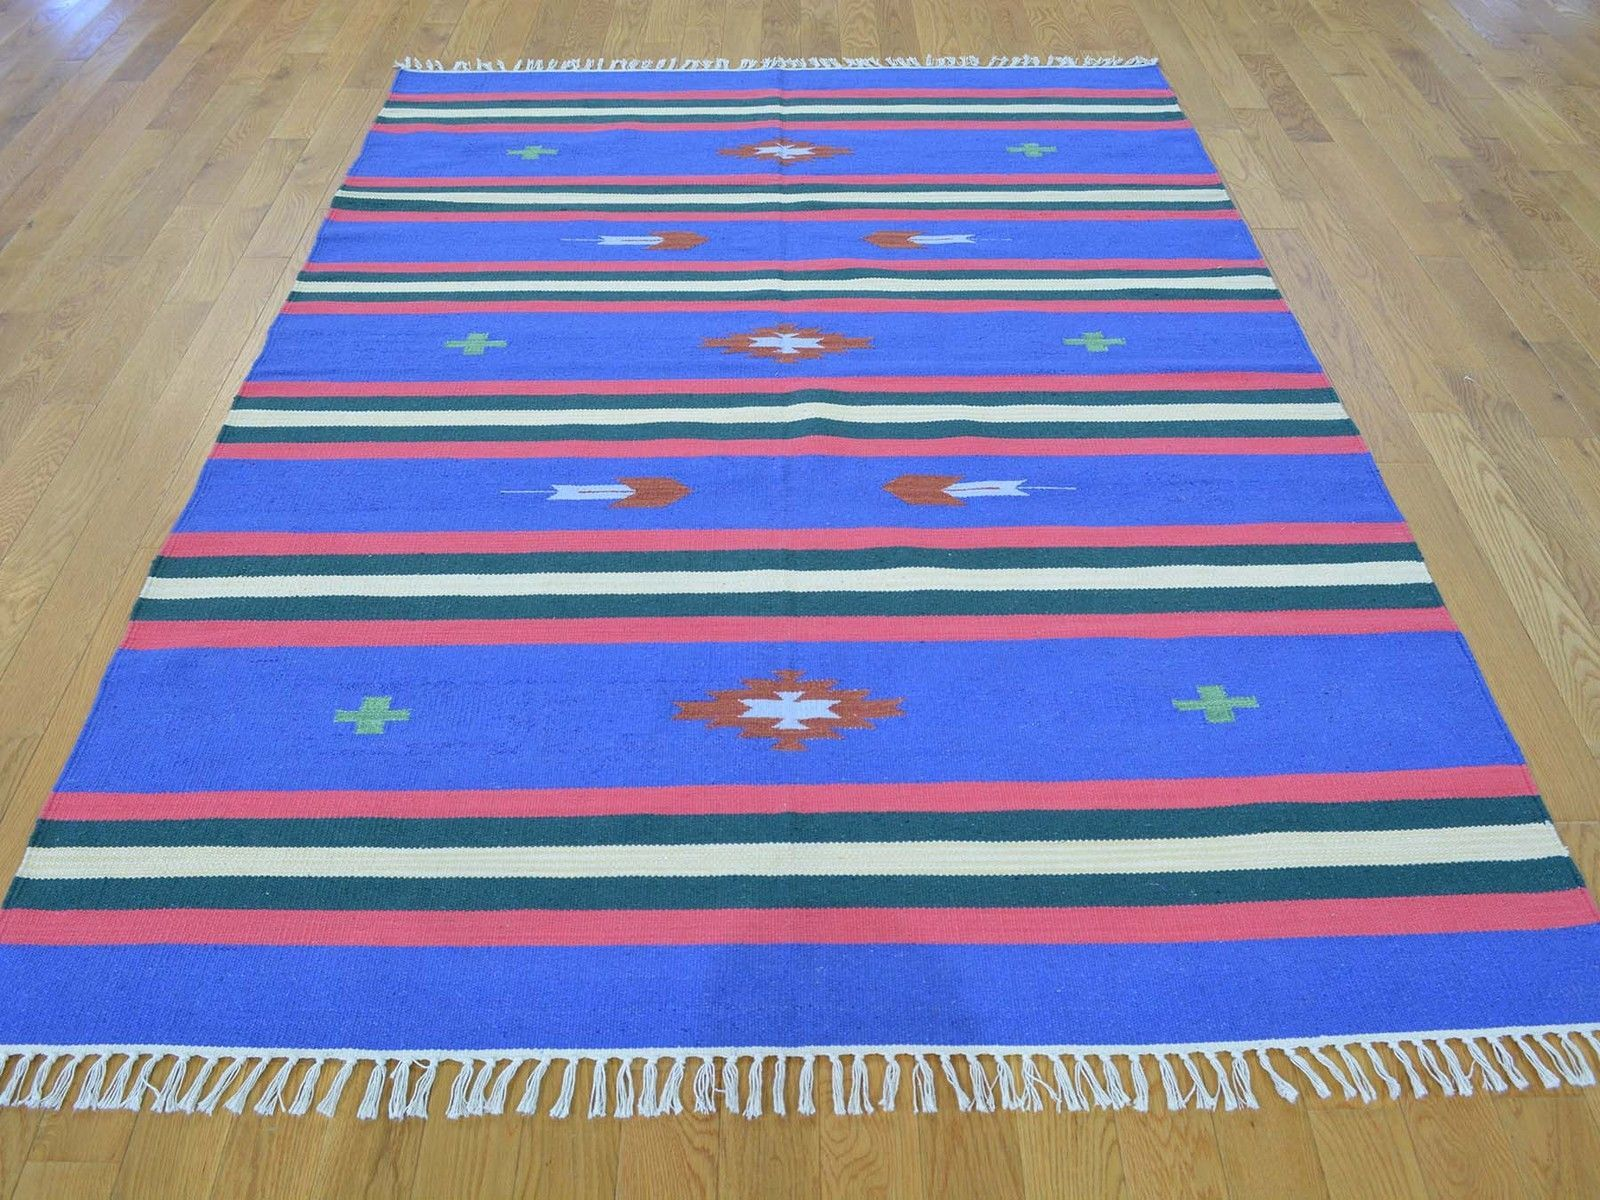 "5'x7'1"" Flat Weave Reversible Kilim Navajo Design Hand Woven Rug G26131"